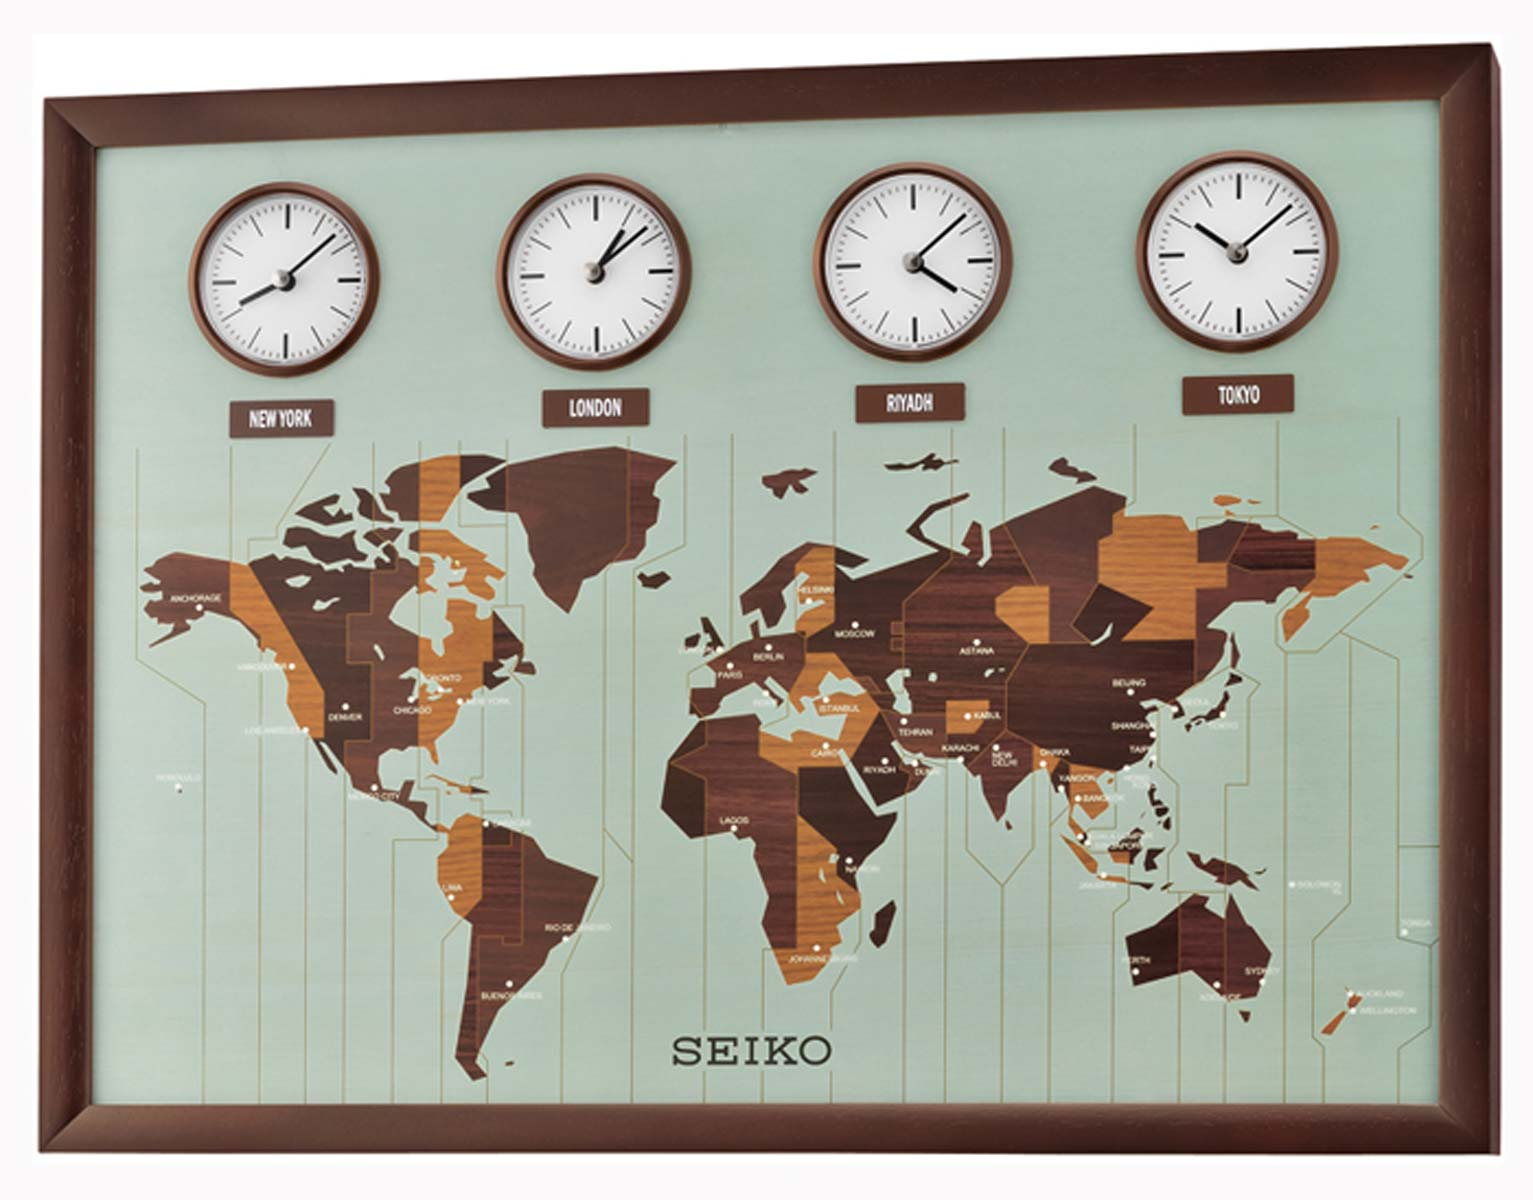 Seiko Qxa648b Wall Clock Xxl Clock Retro Clock